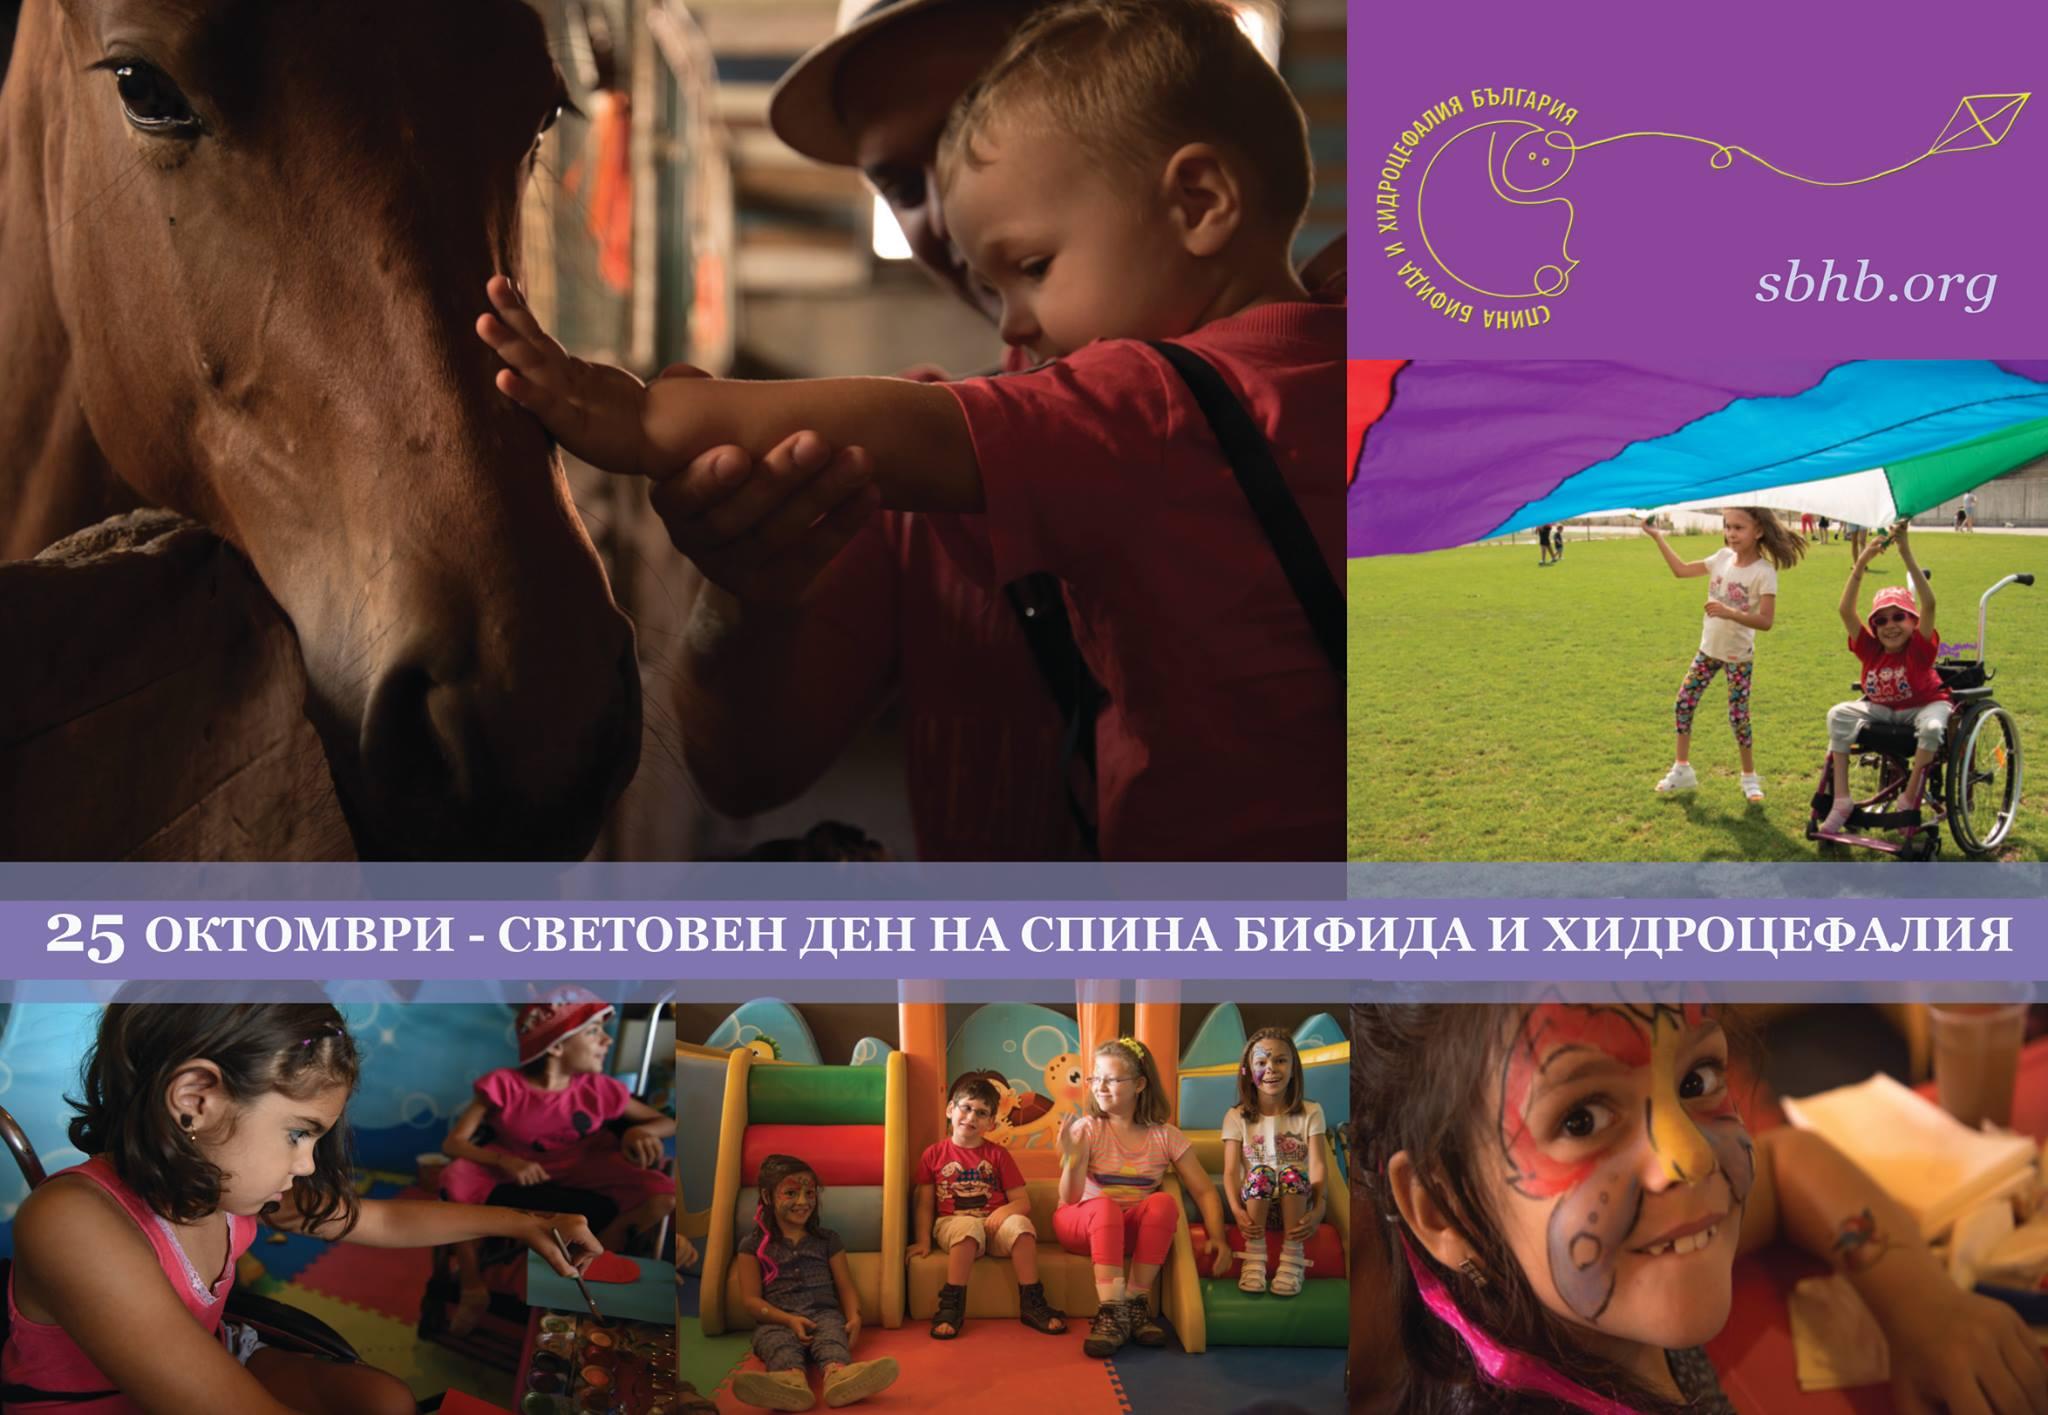 BULGARIA | SBHB